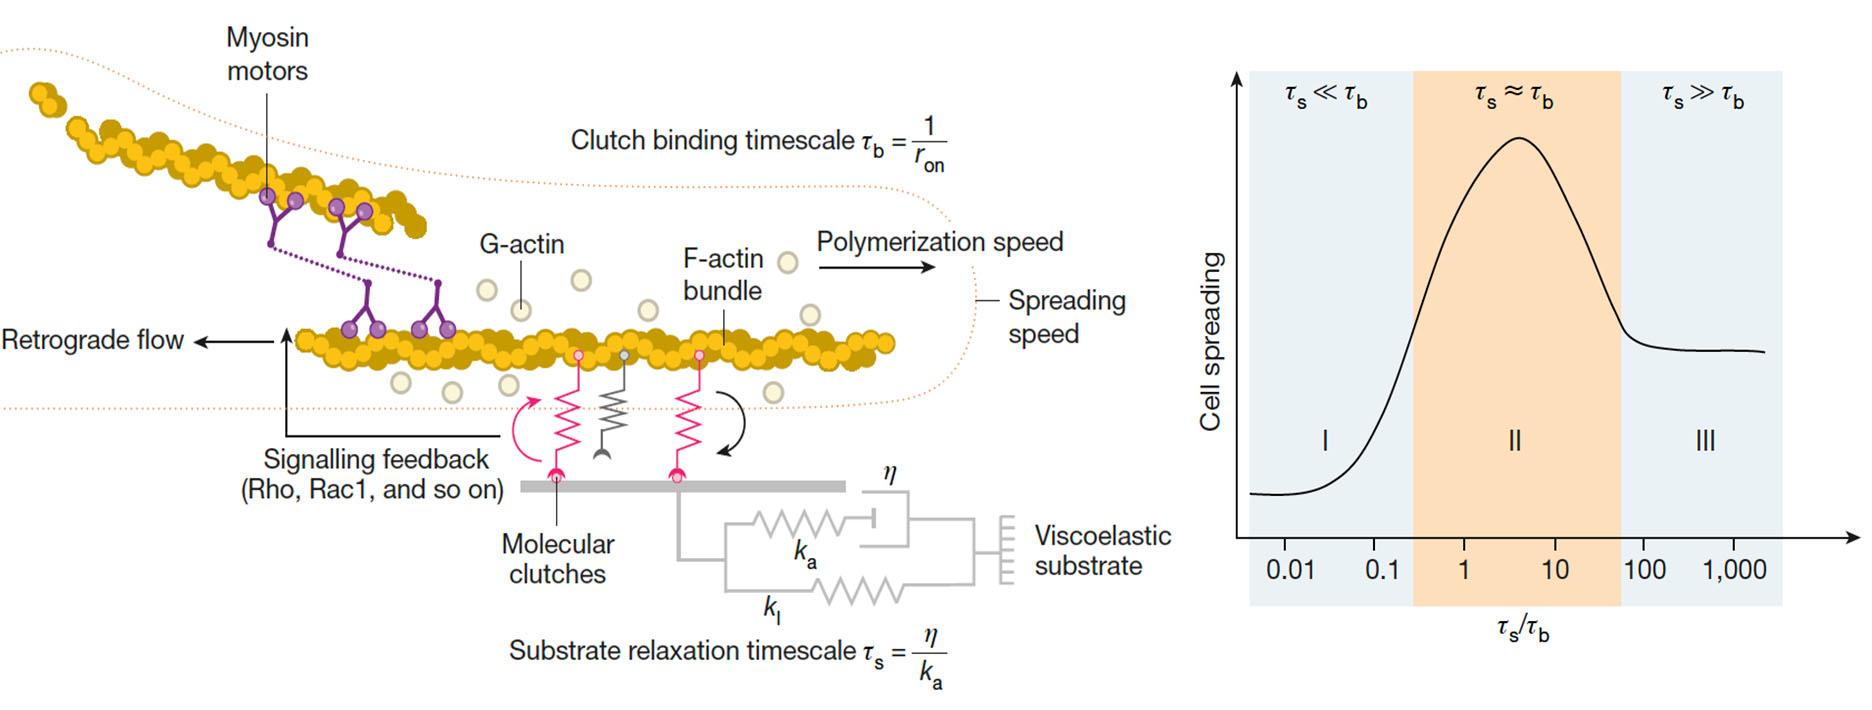 molecular clutch model figure